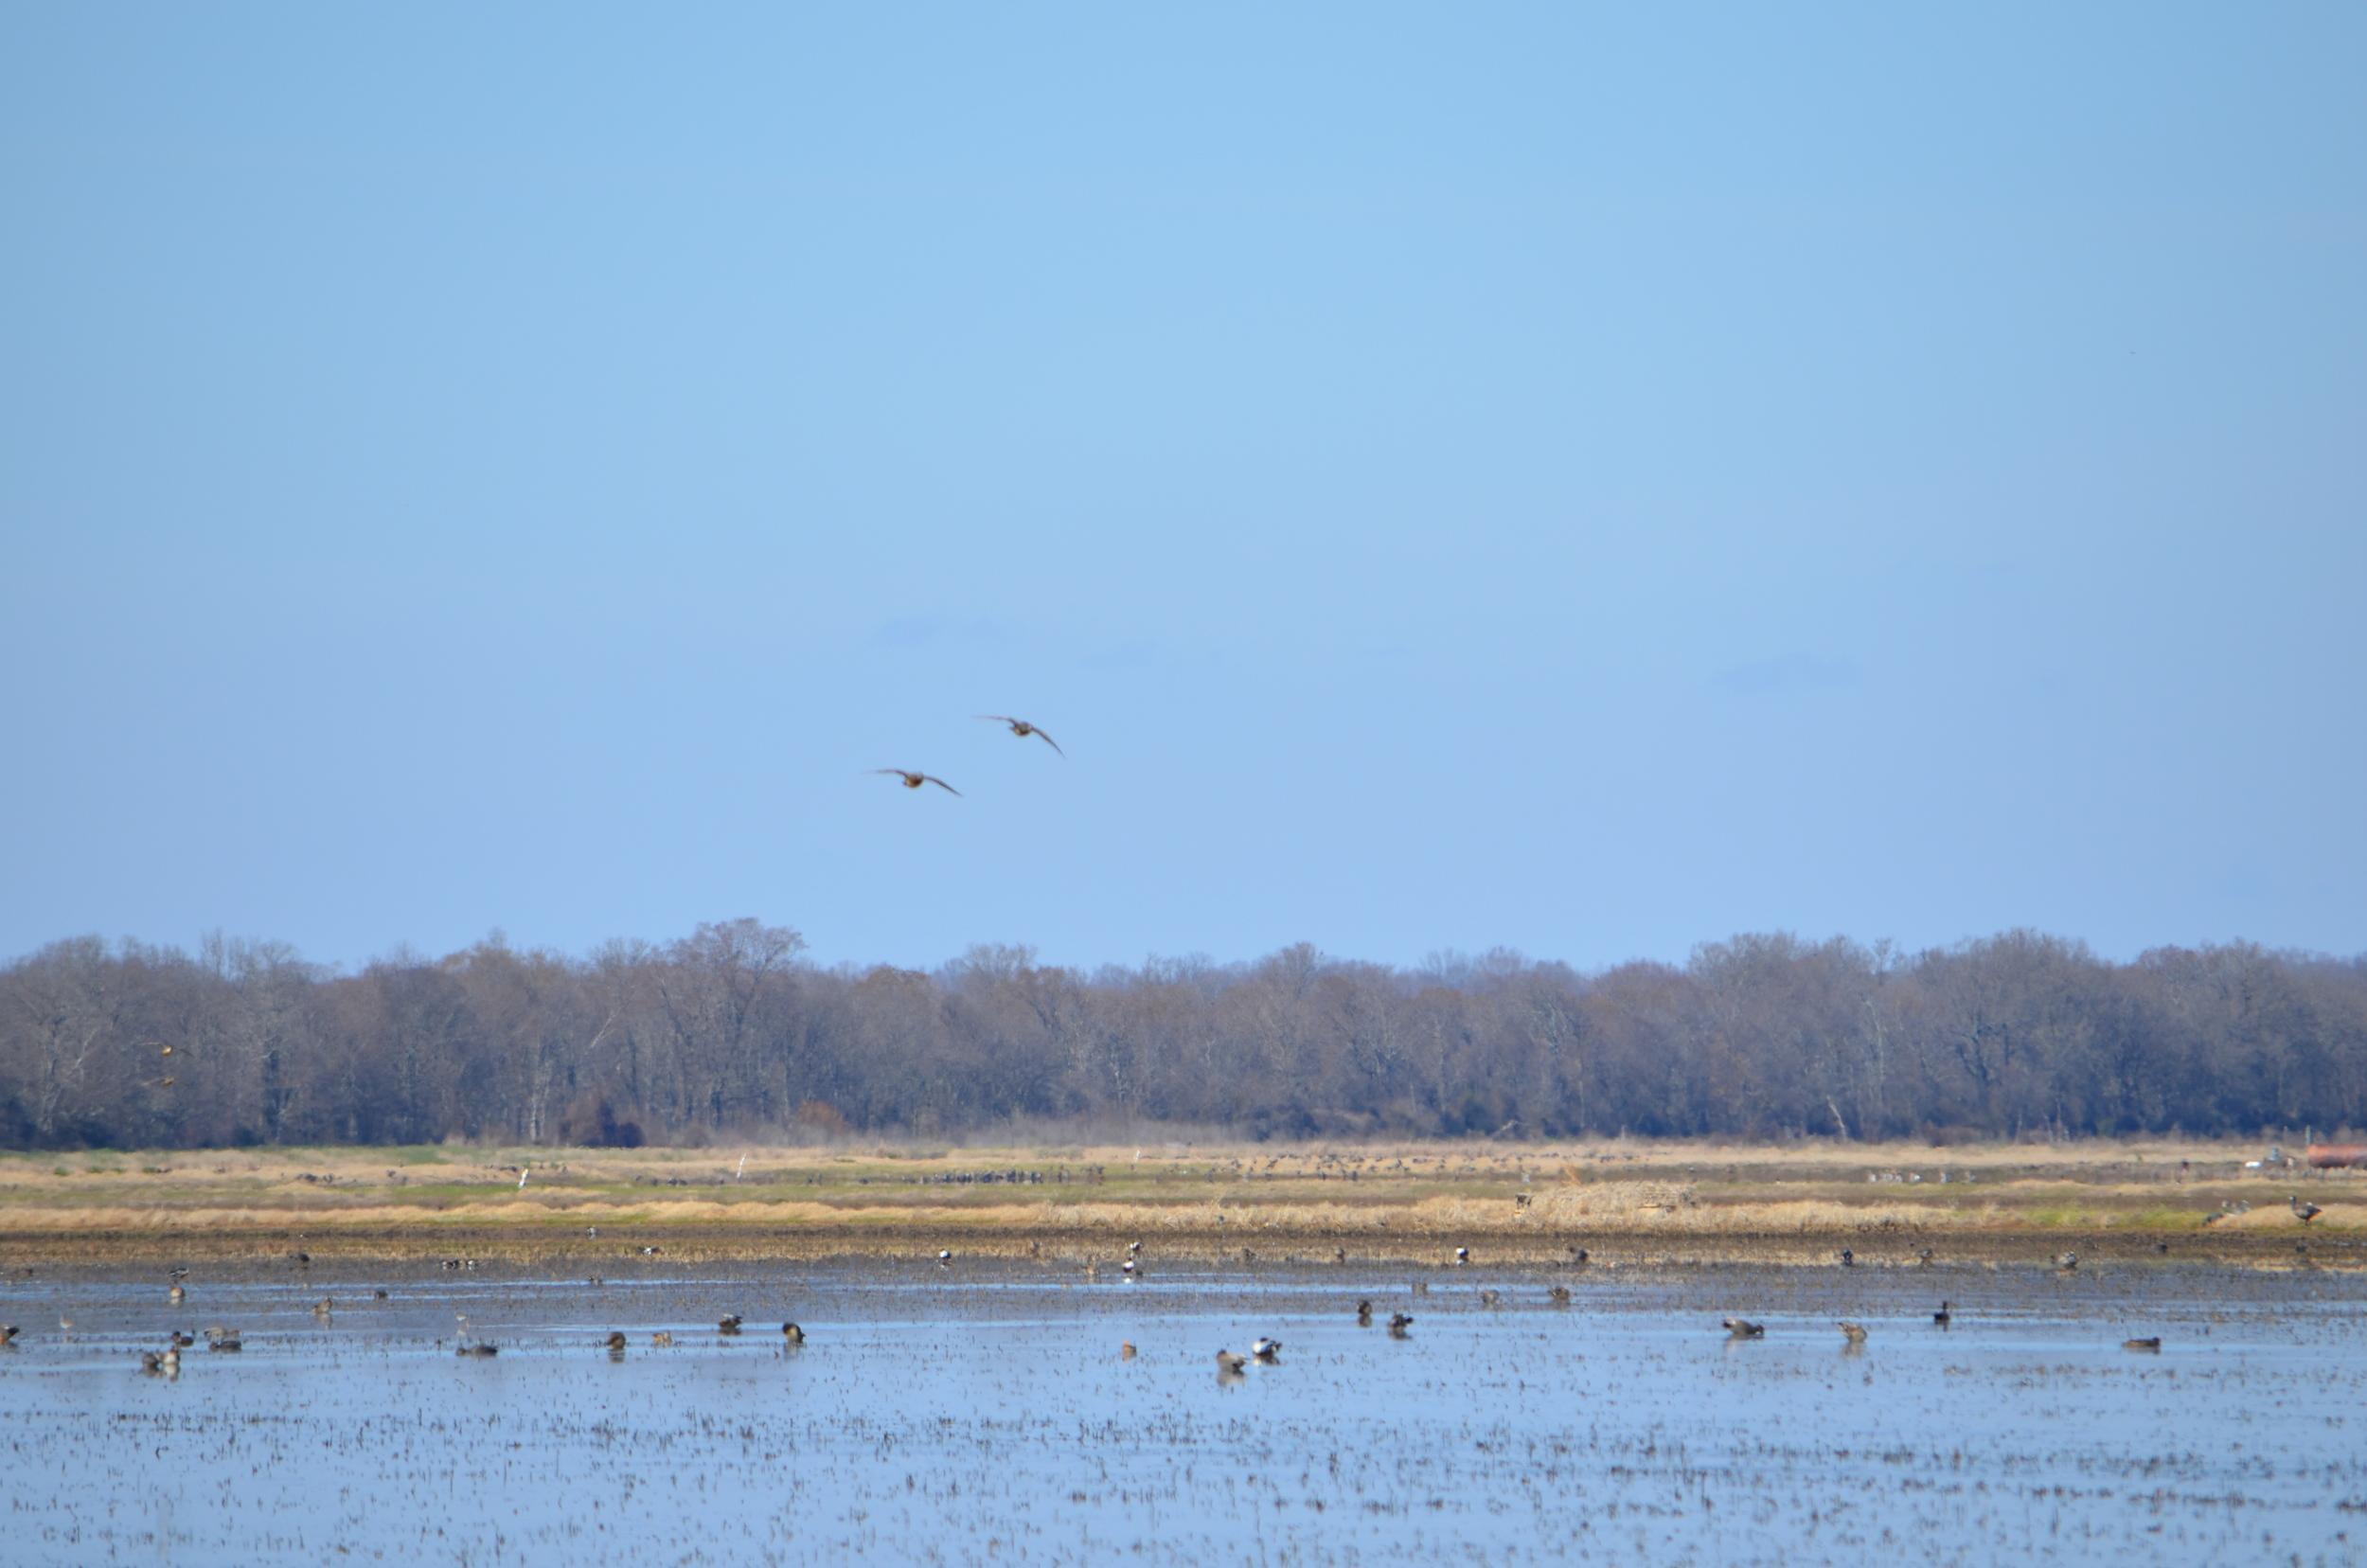 ducks enjoying a flooded rice field in the winter